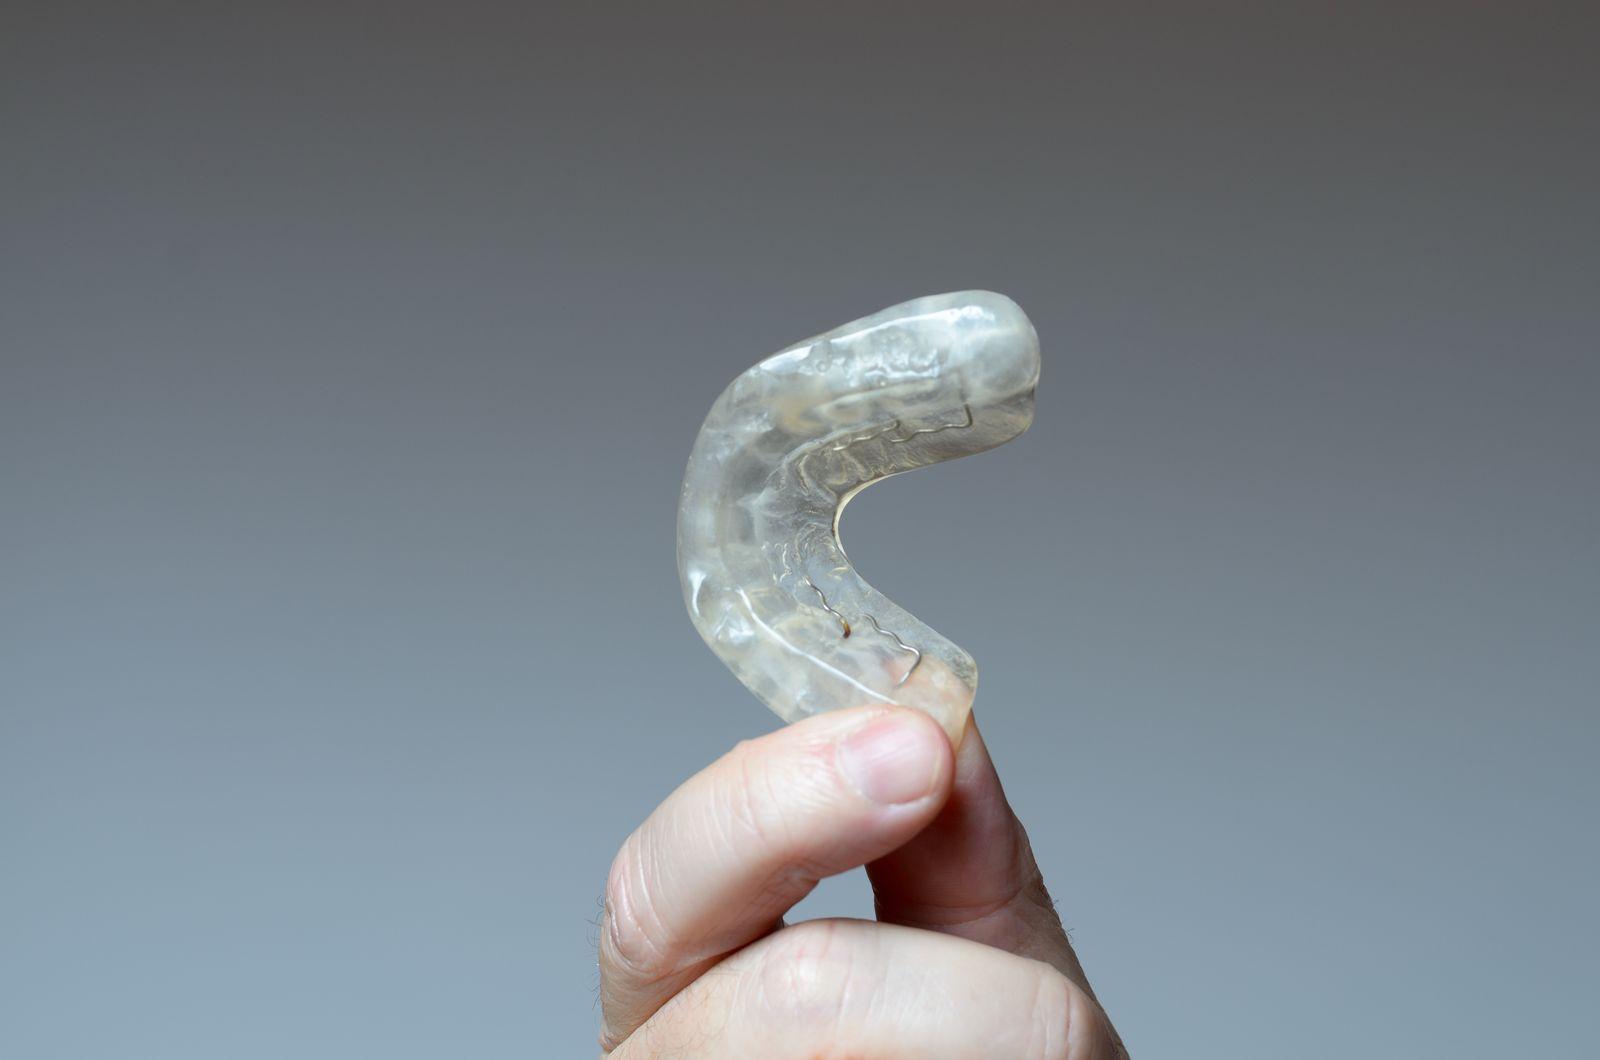 mandibular advancement device for sleep apnea